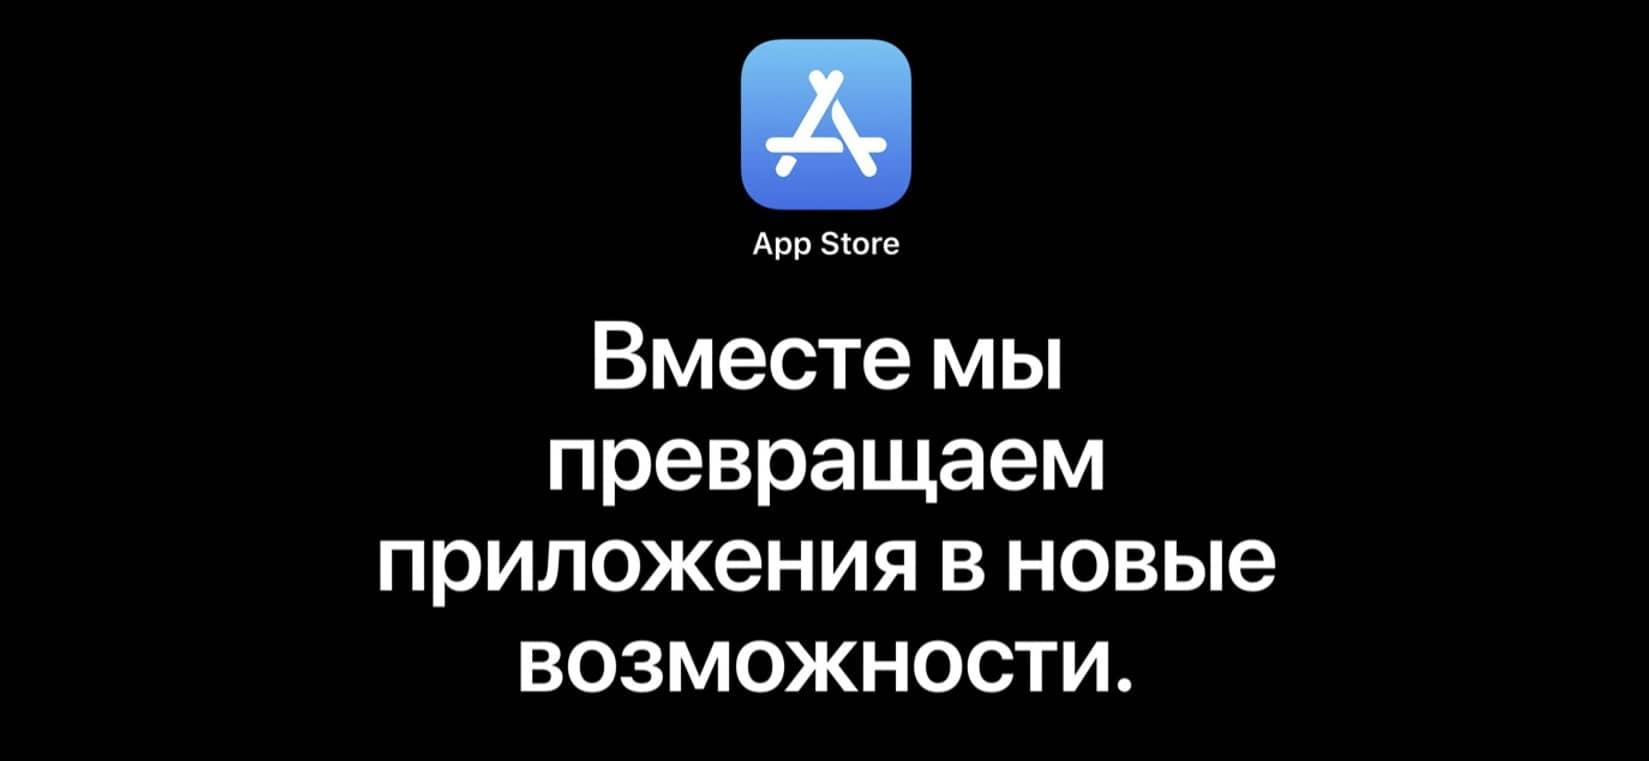 app store russe